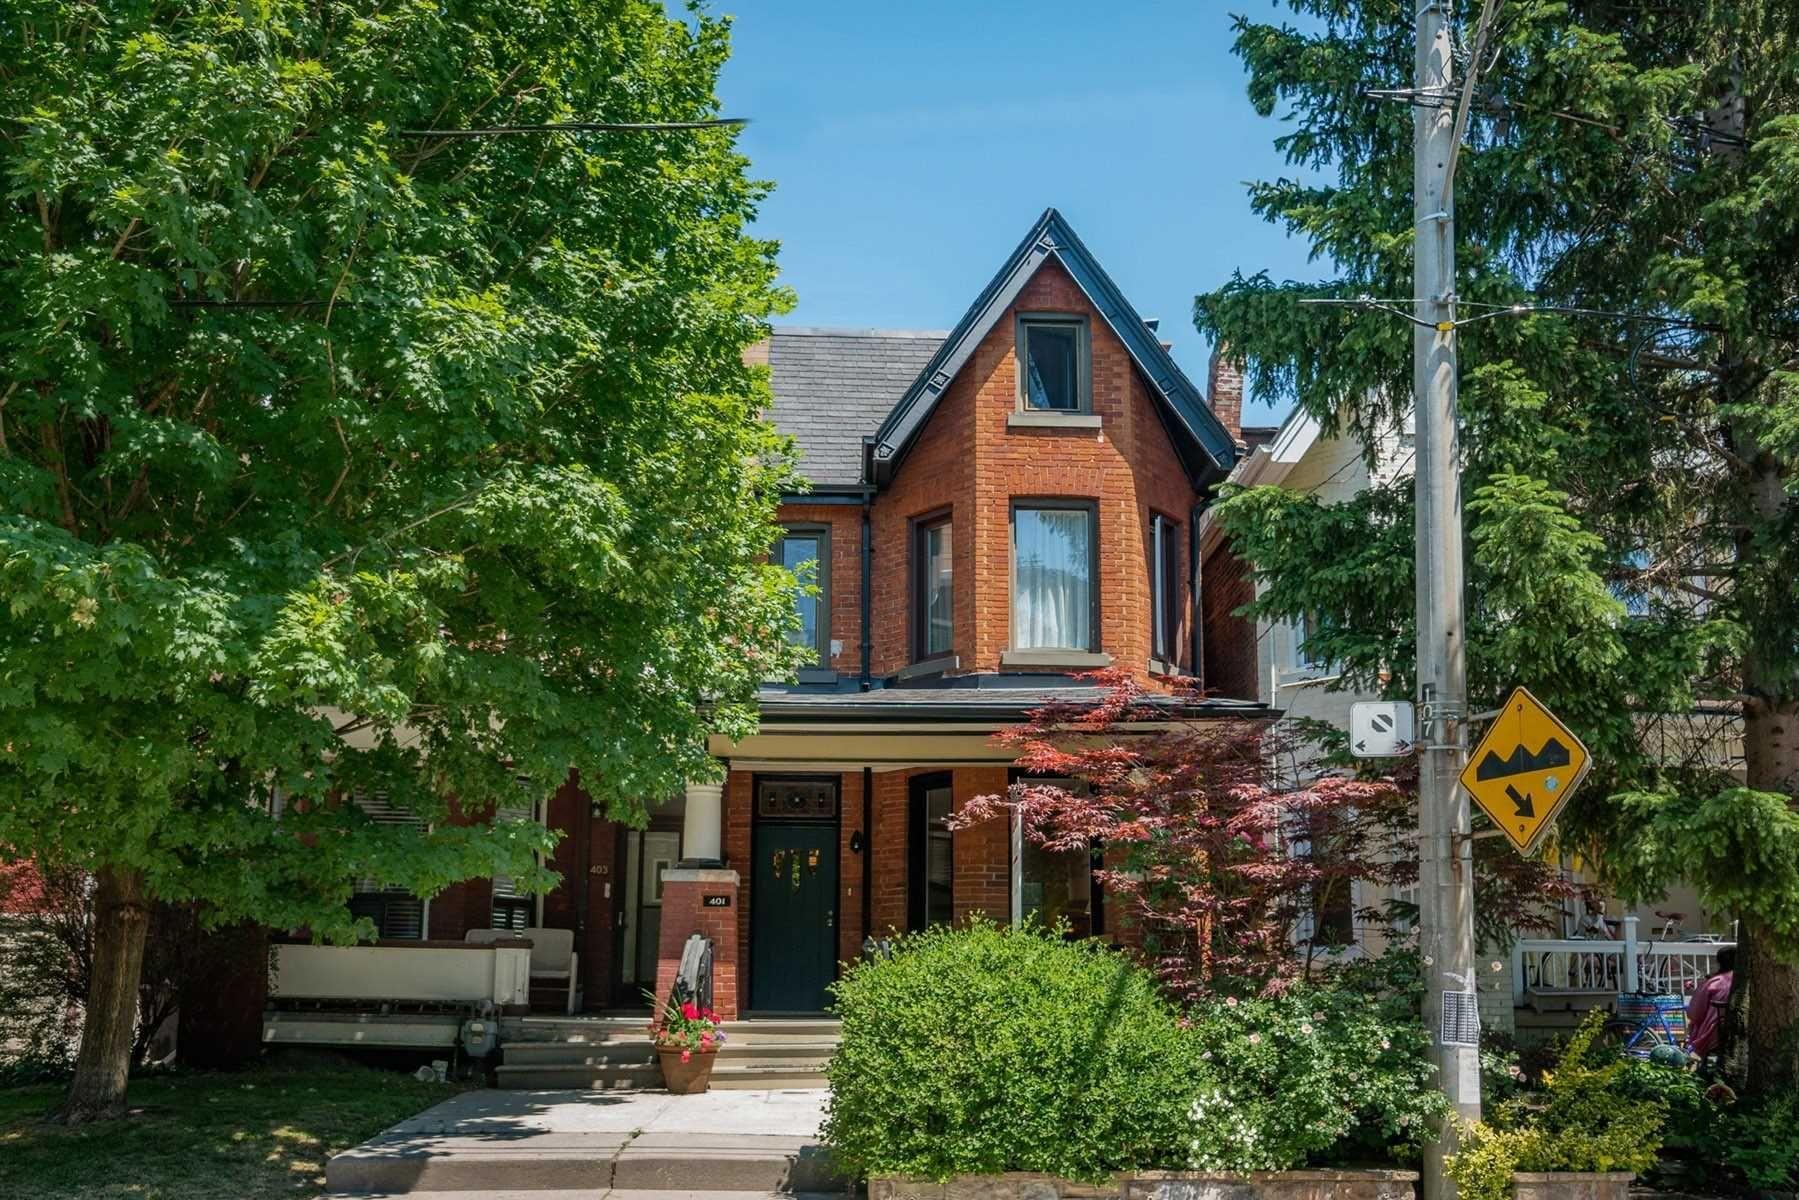 Main Photo: 401 Shaw Street in Toronto: Trinity-Bellwoods House (3-Storey) for sale (Toronto C01)  : MLS®# C4804197